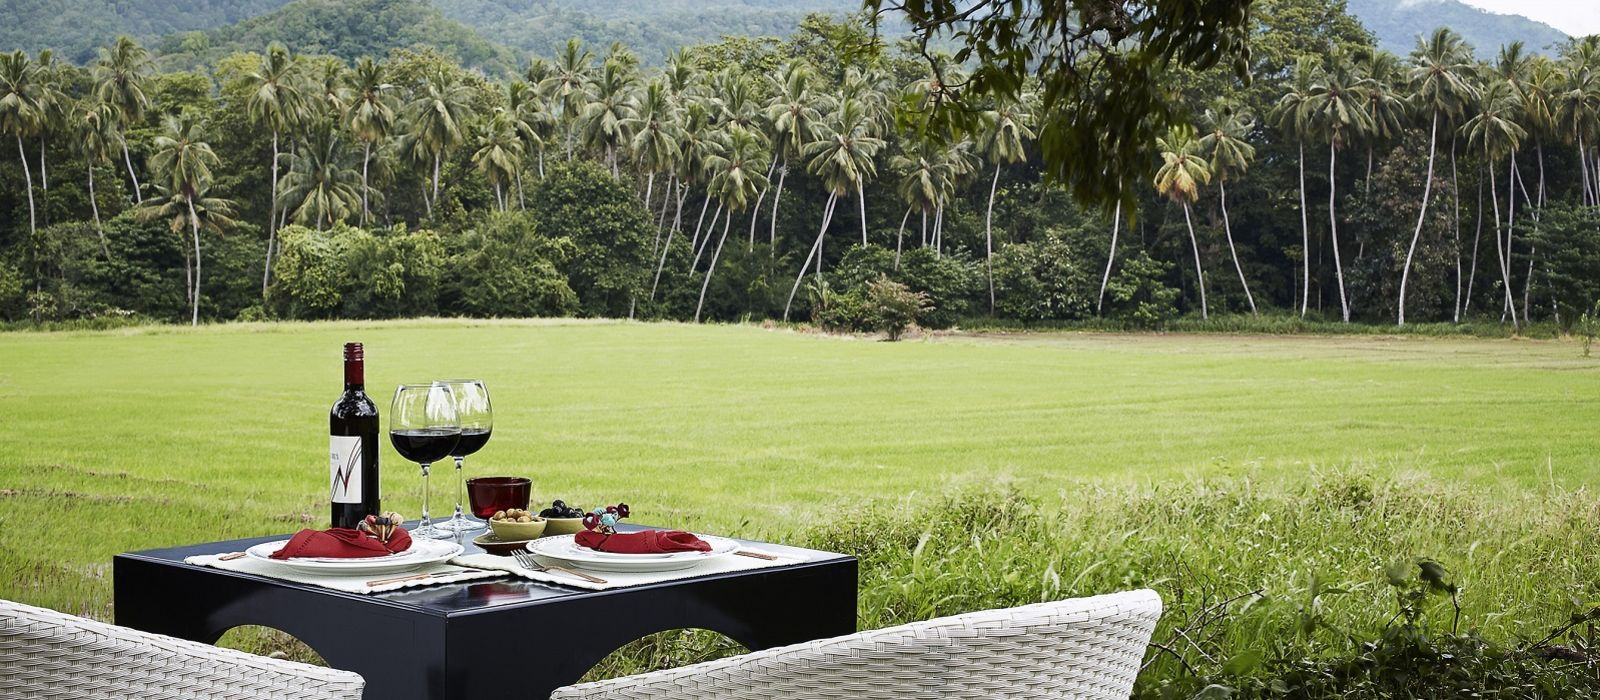 Hotel Jetwing Kaduruketha Sri Lanka